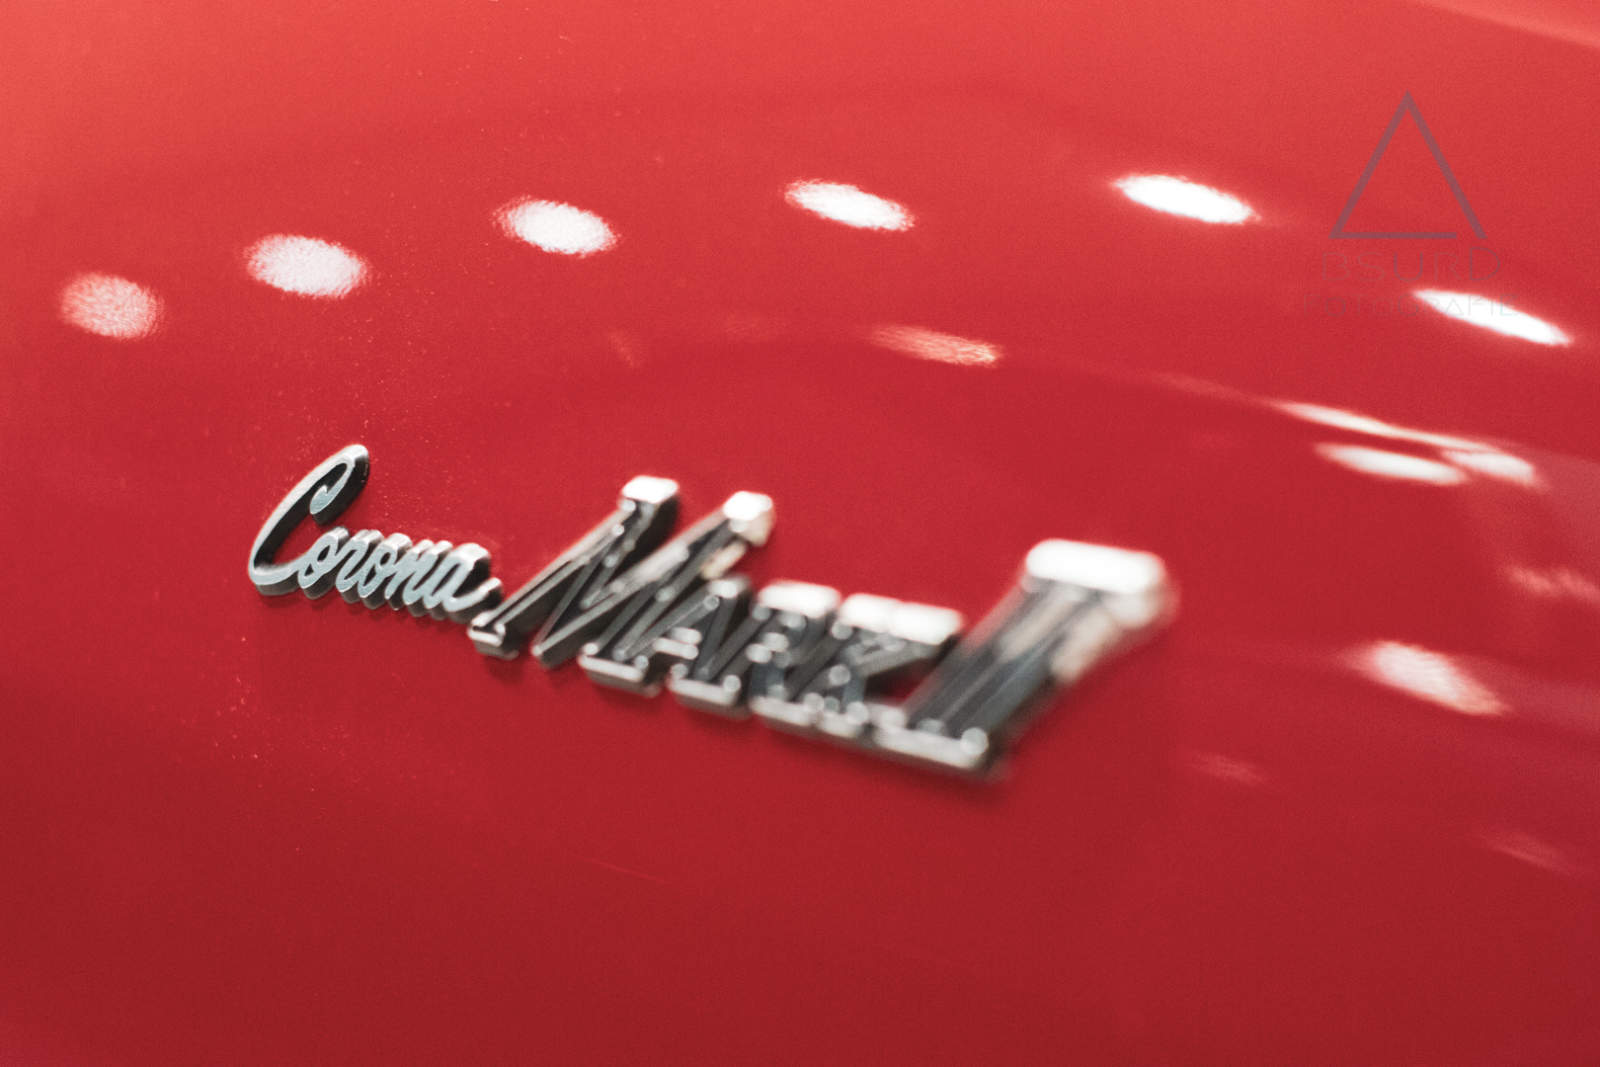 2019-01-05-Toyota-Collection-Koeln - DSC01829-edit-121.jpg